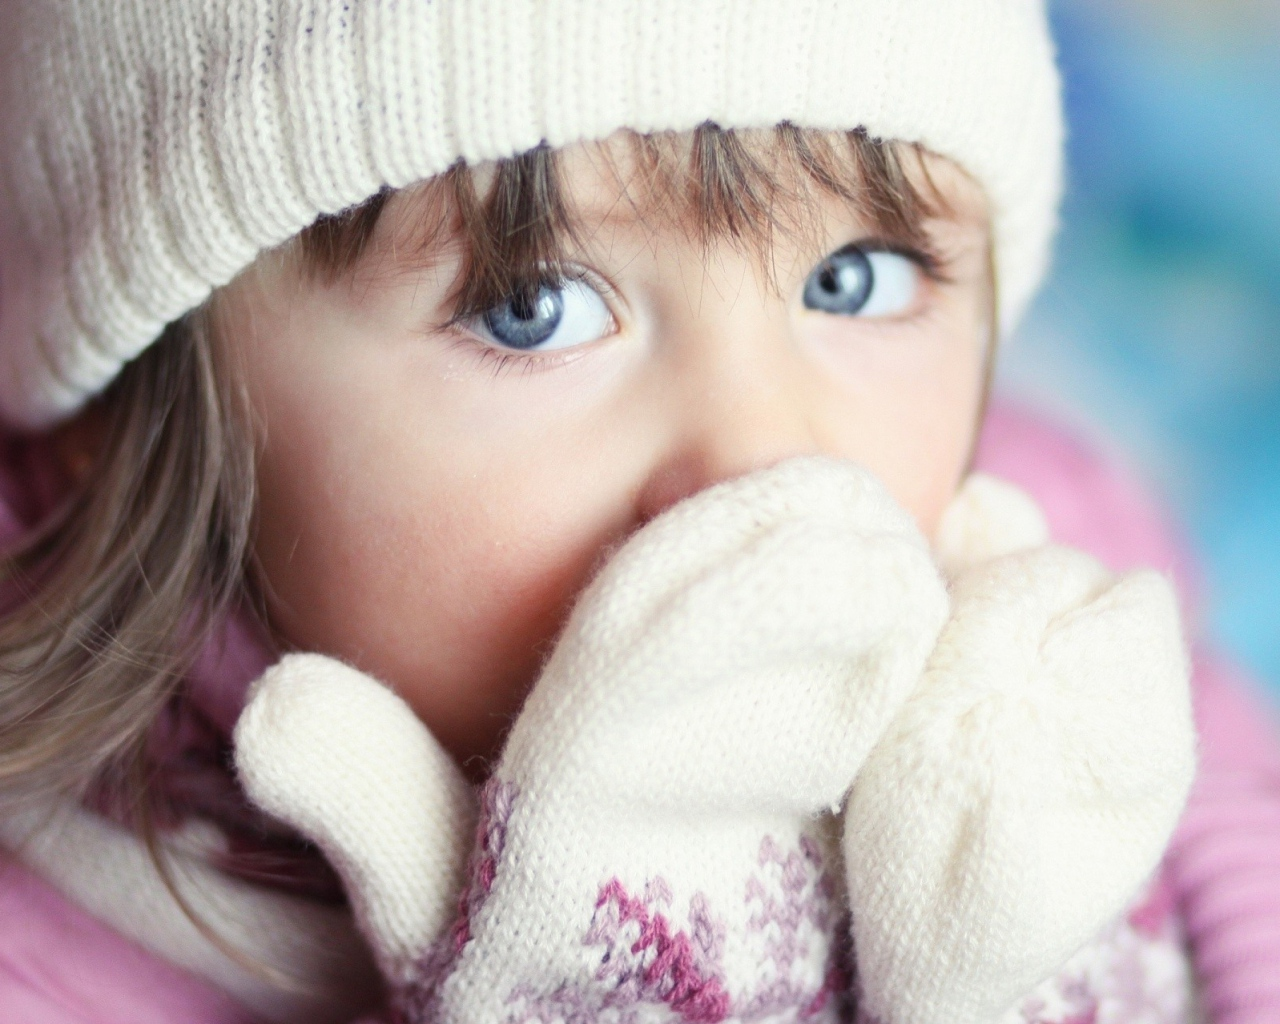 girl_child_blue_eyes_gloves_hat_95250_1280x1024